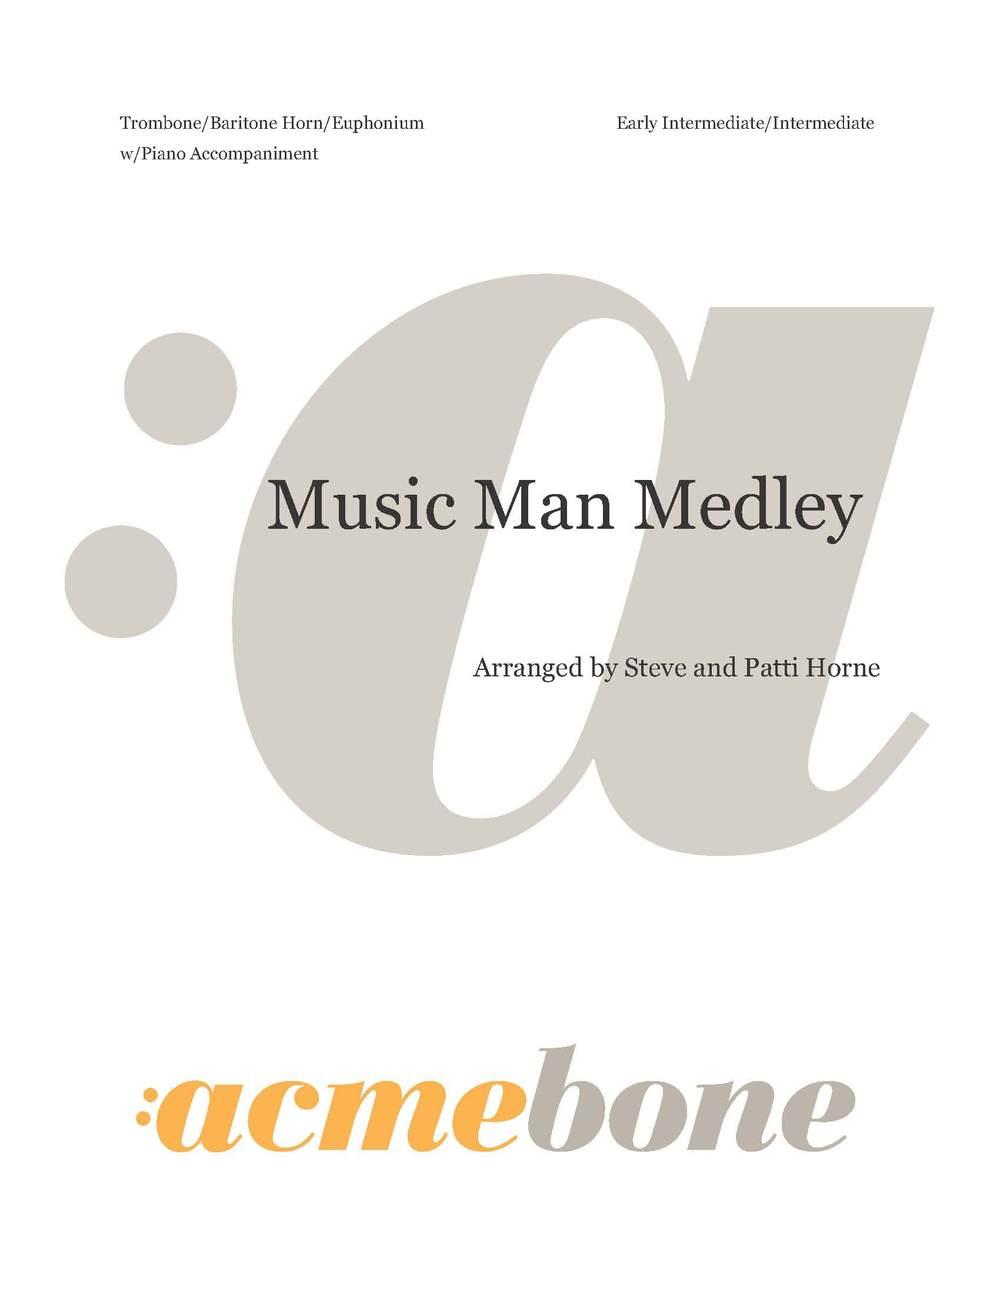 Music Man Medley_cover.jpg